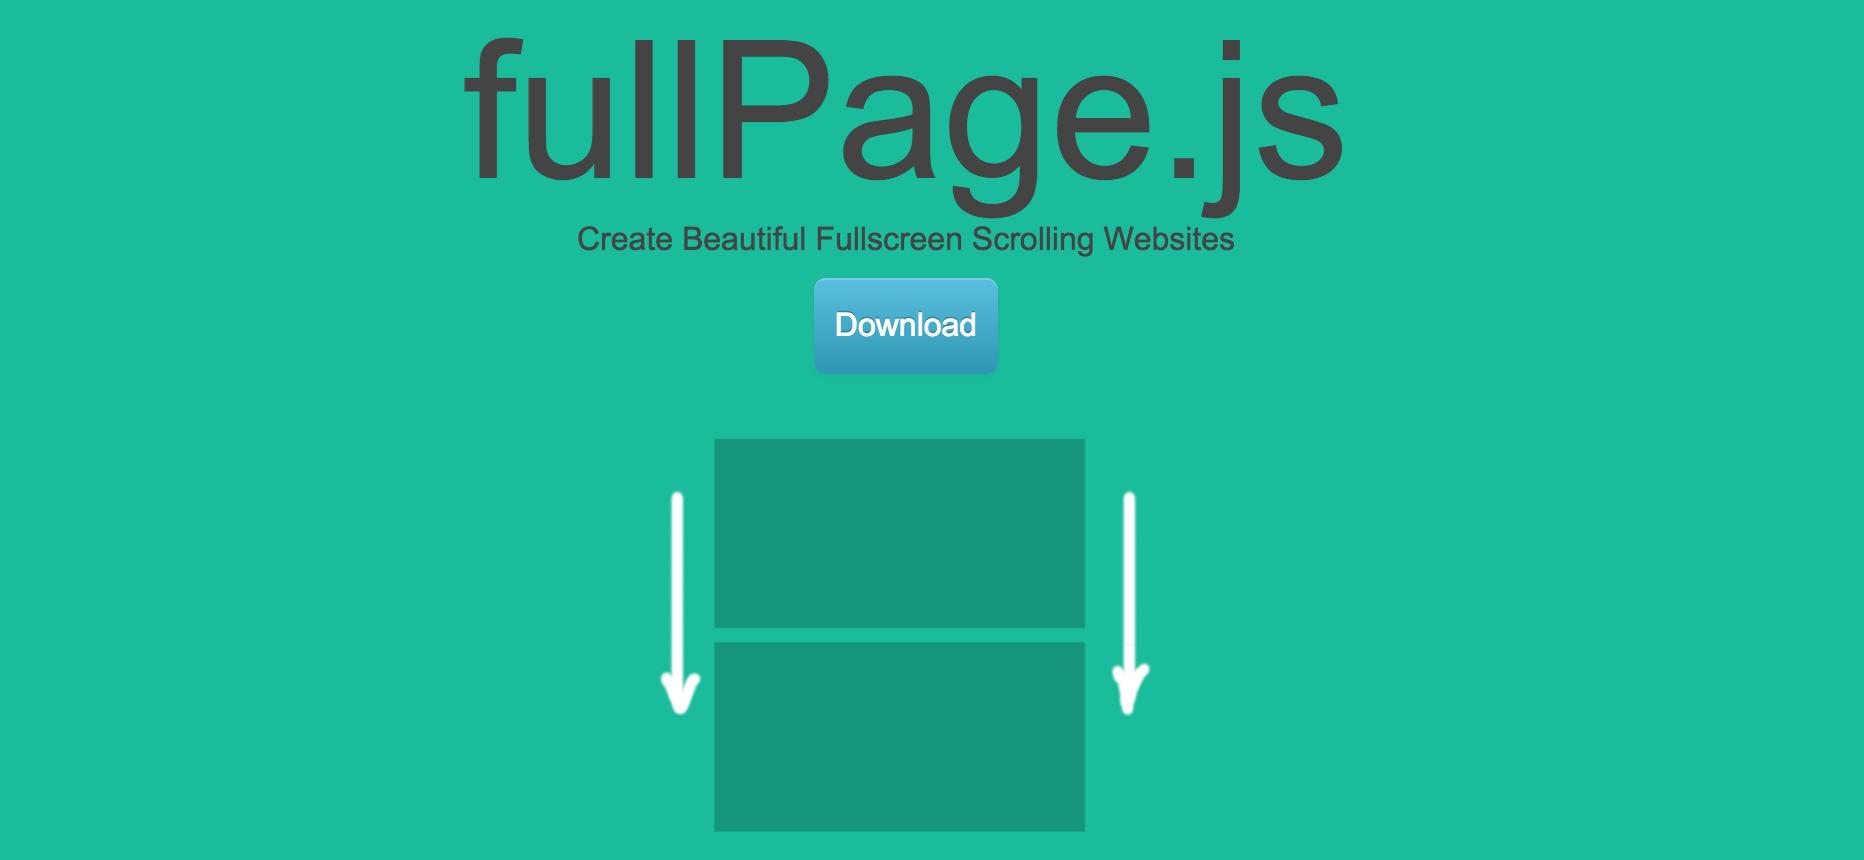 Homepage screenshot for fullPage.js